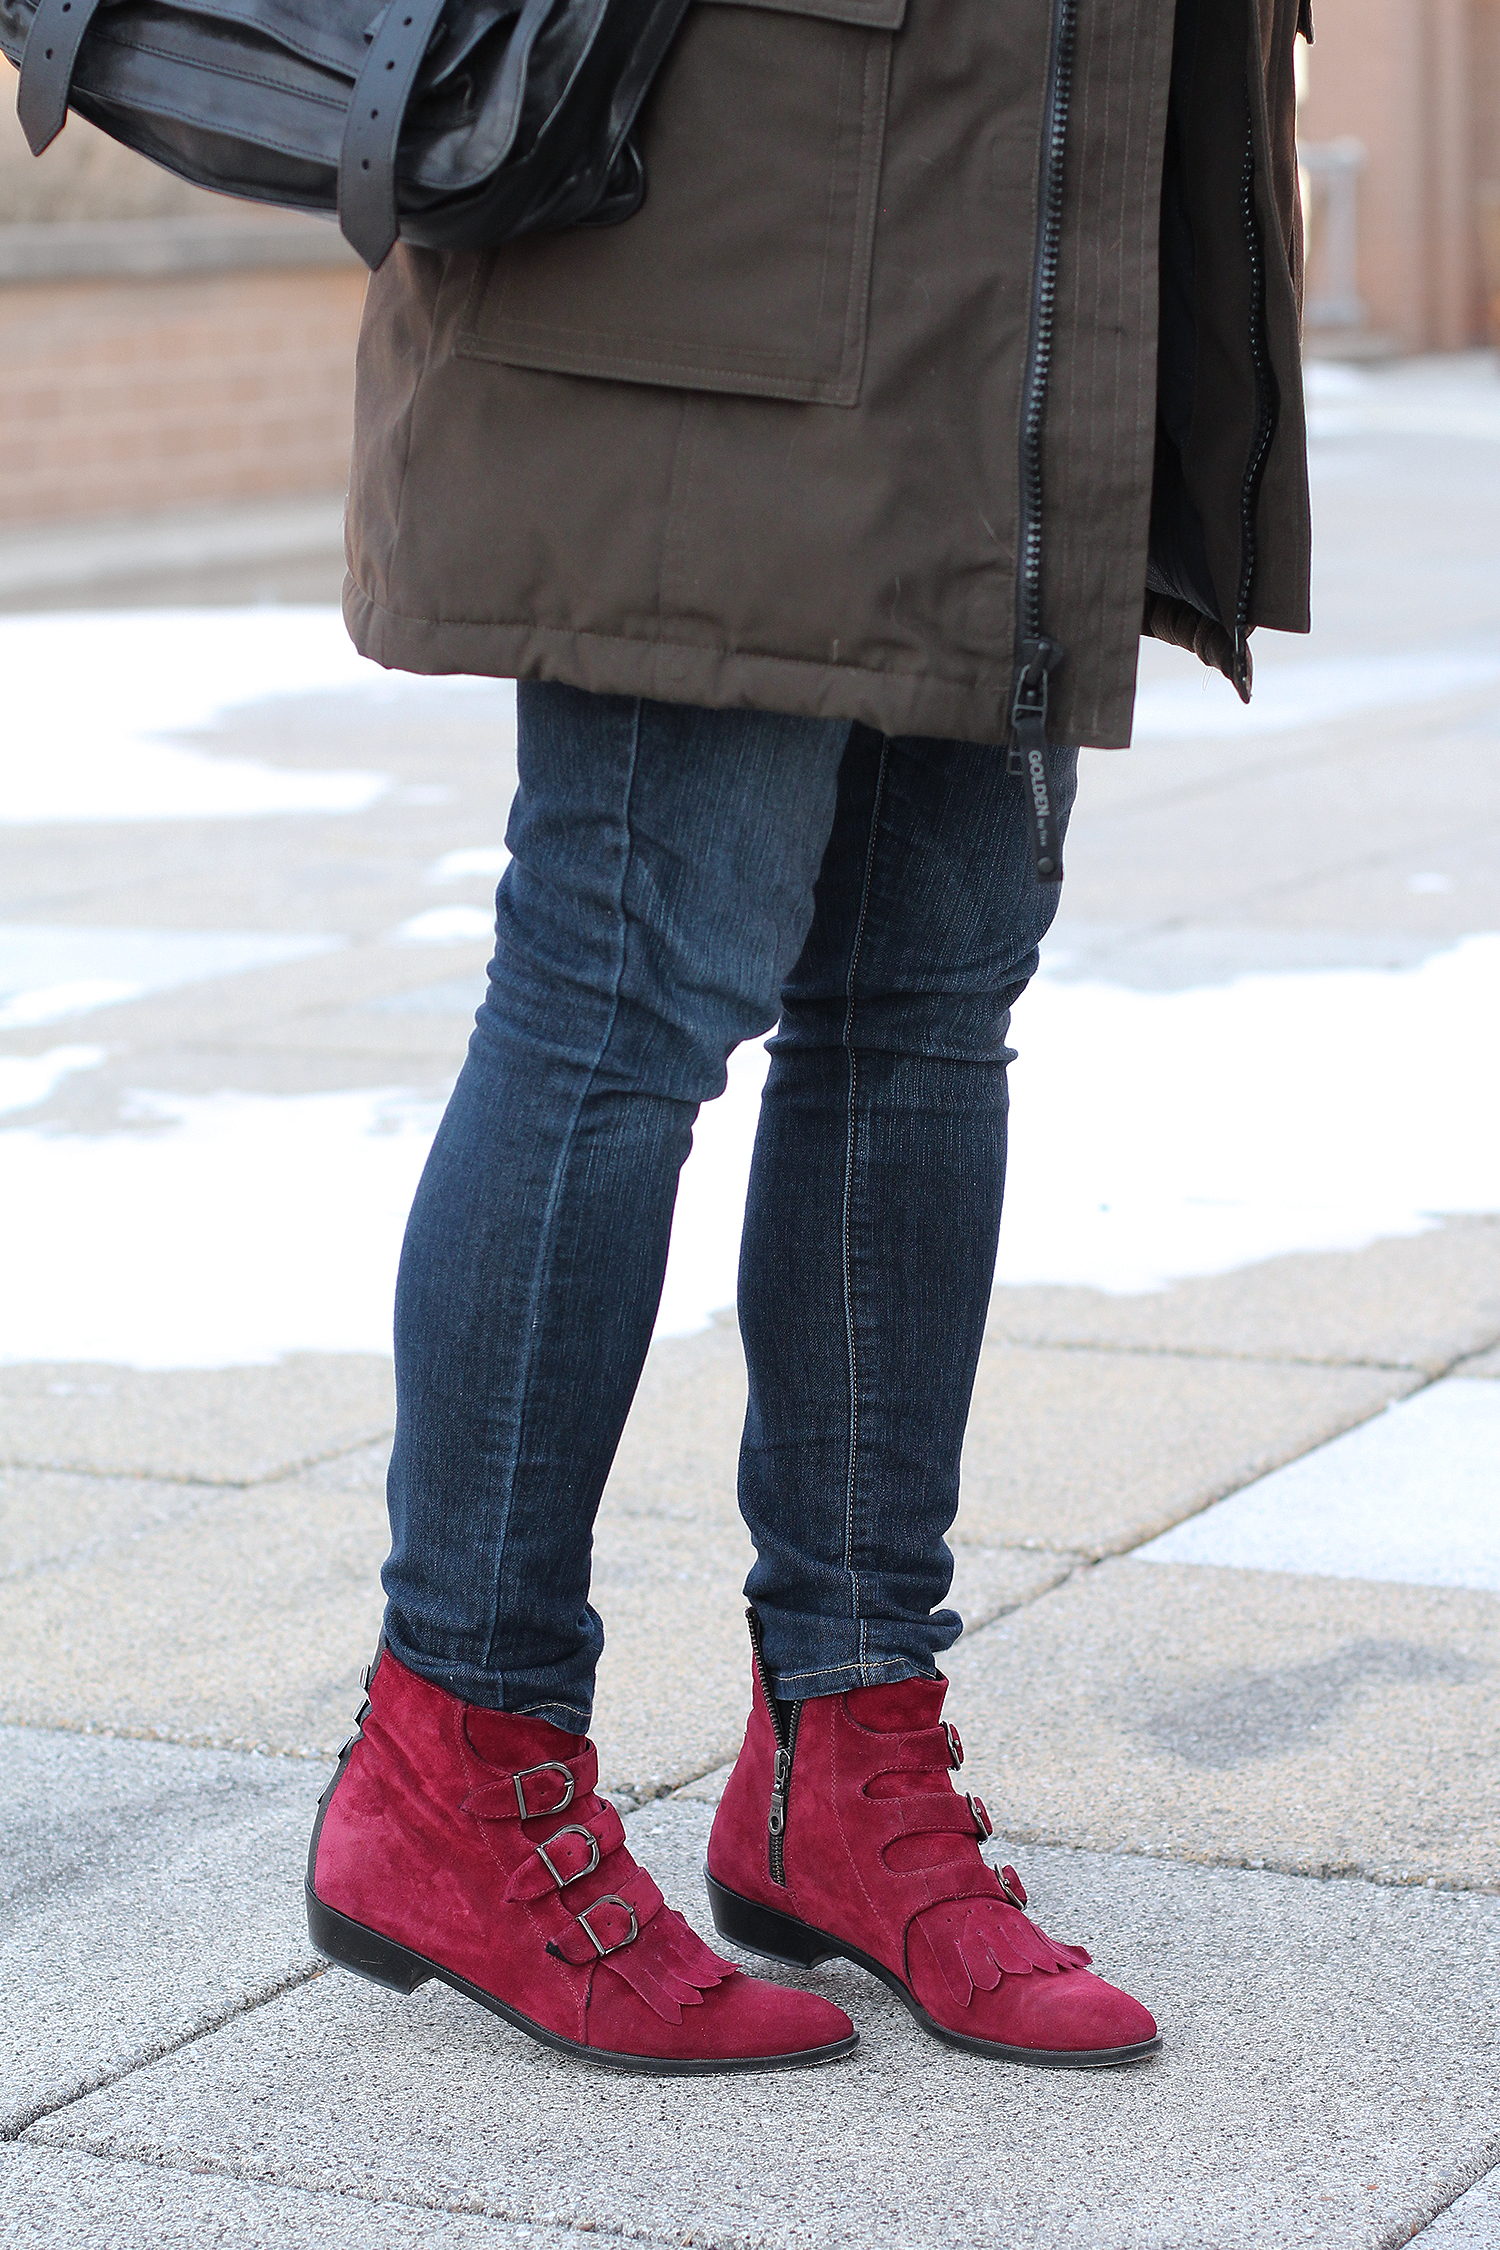 Modern Vice Boots, Paige Denim Jeans